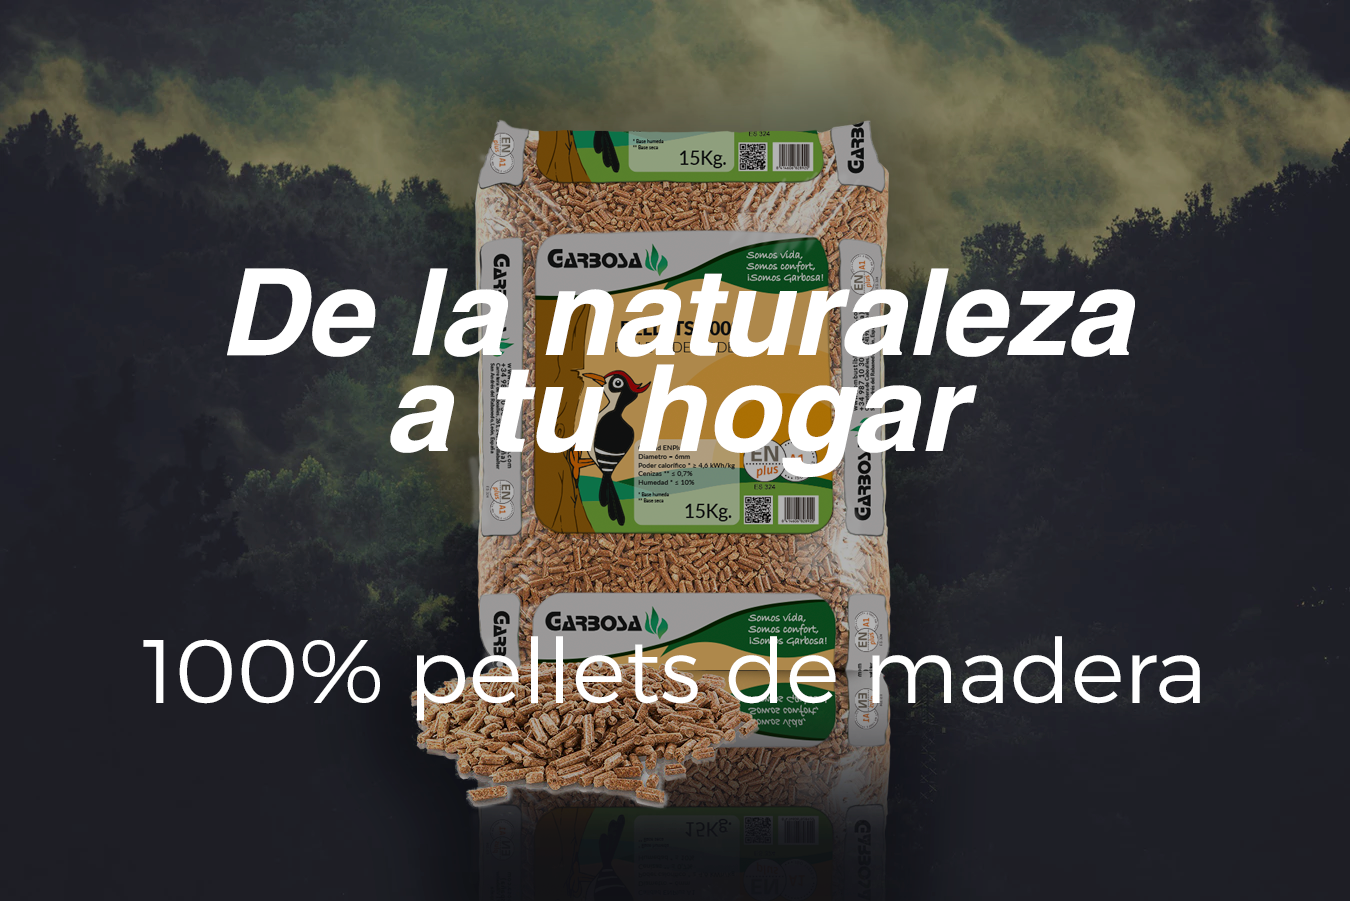 Pelletsde madera 100% natural.